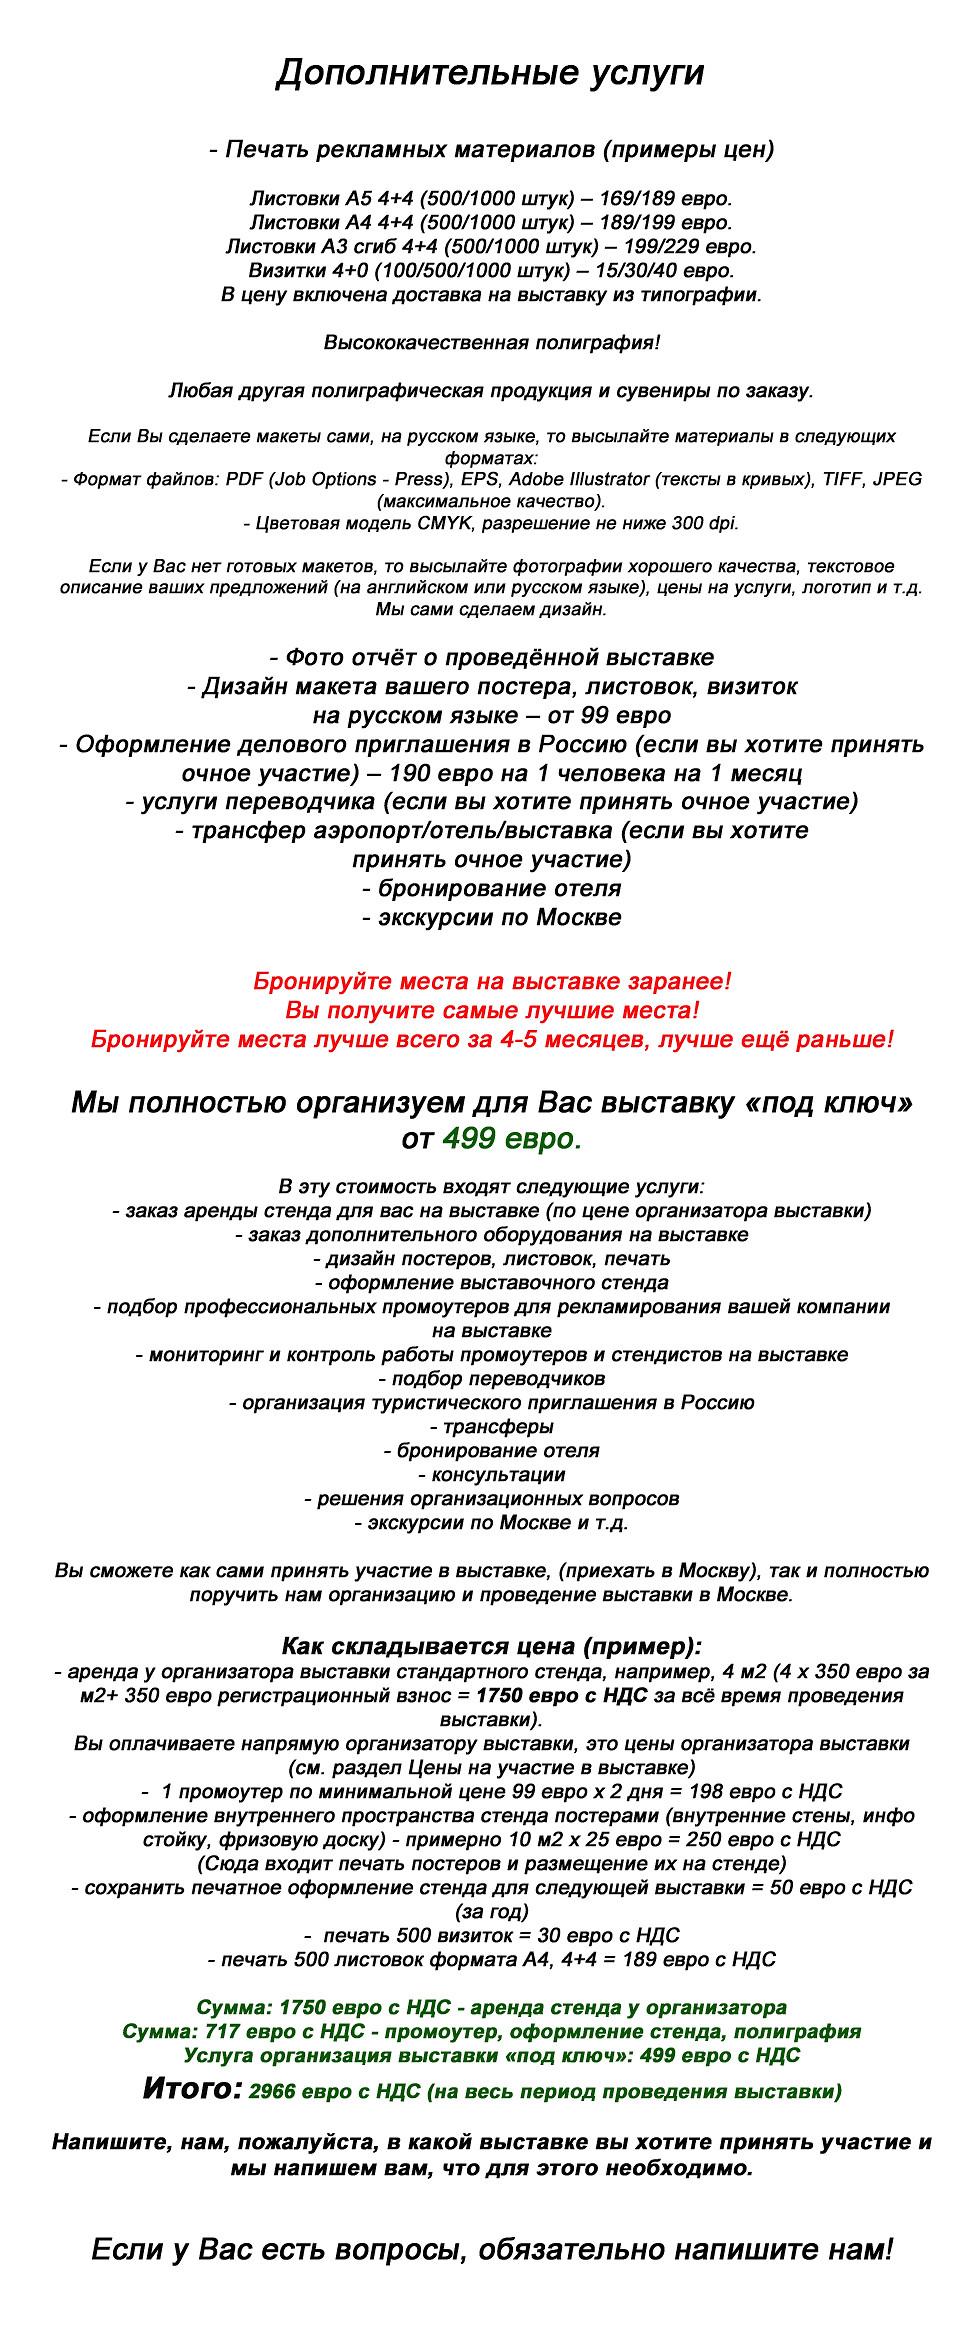 5 Грузия доп услуги рус.jpg